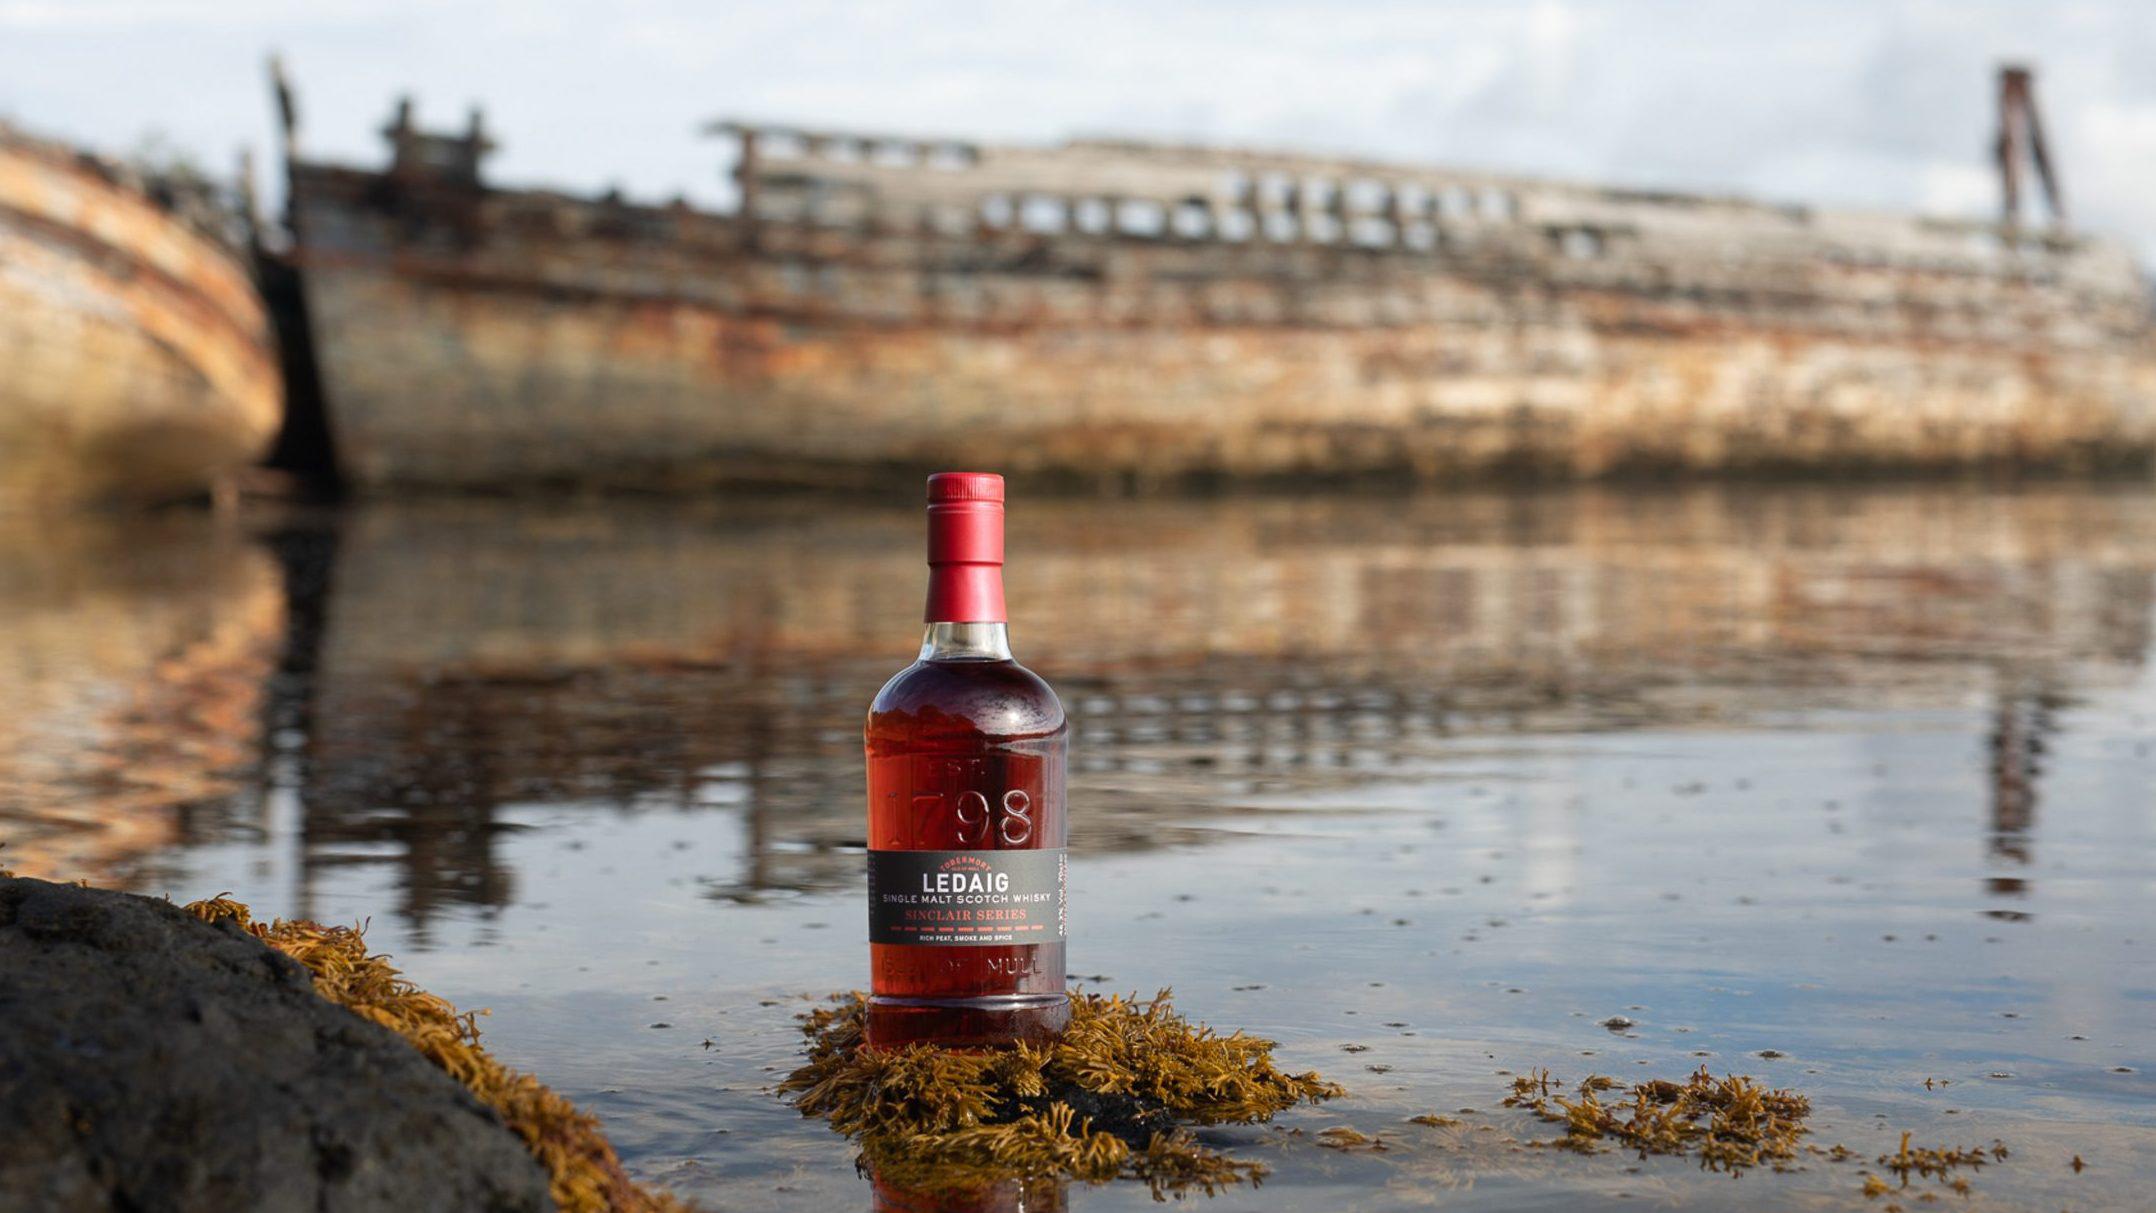 Tobermory Debuts Ledaig Rioja Cask Finish And Mountain Gin